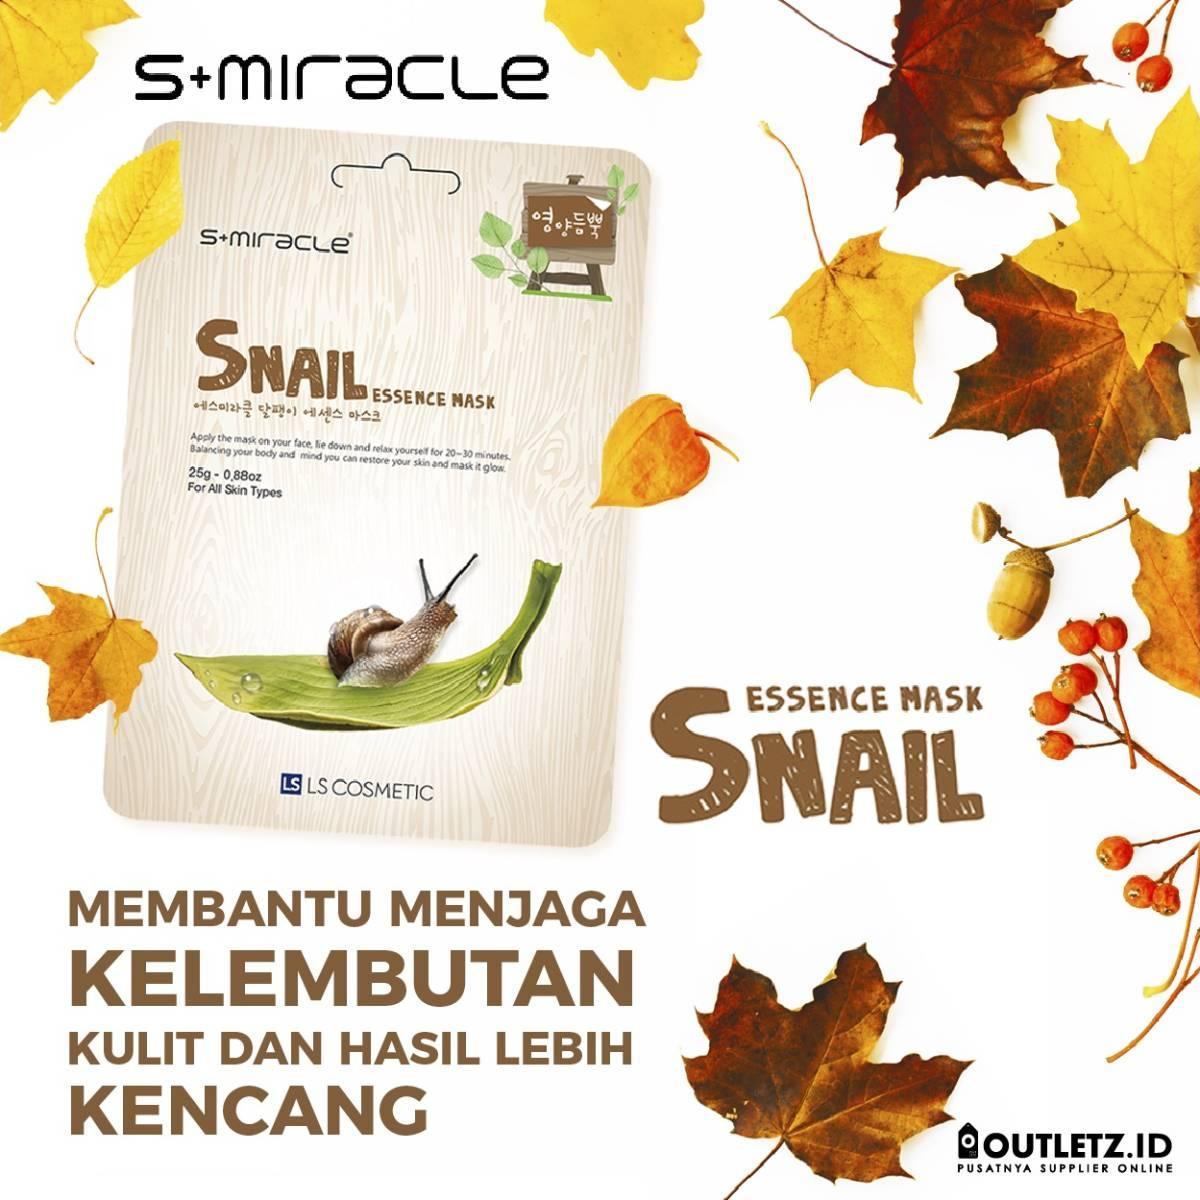 Masker Wajah Korea Snail - S+miracle Snail Essence Mask0